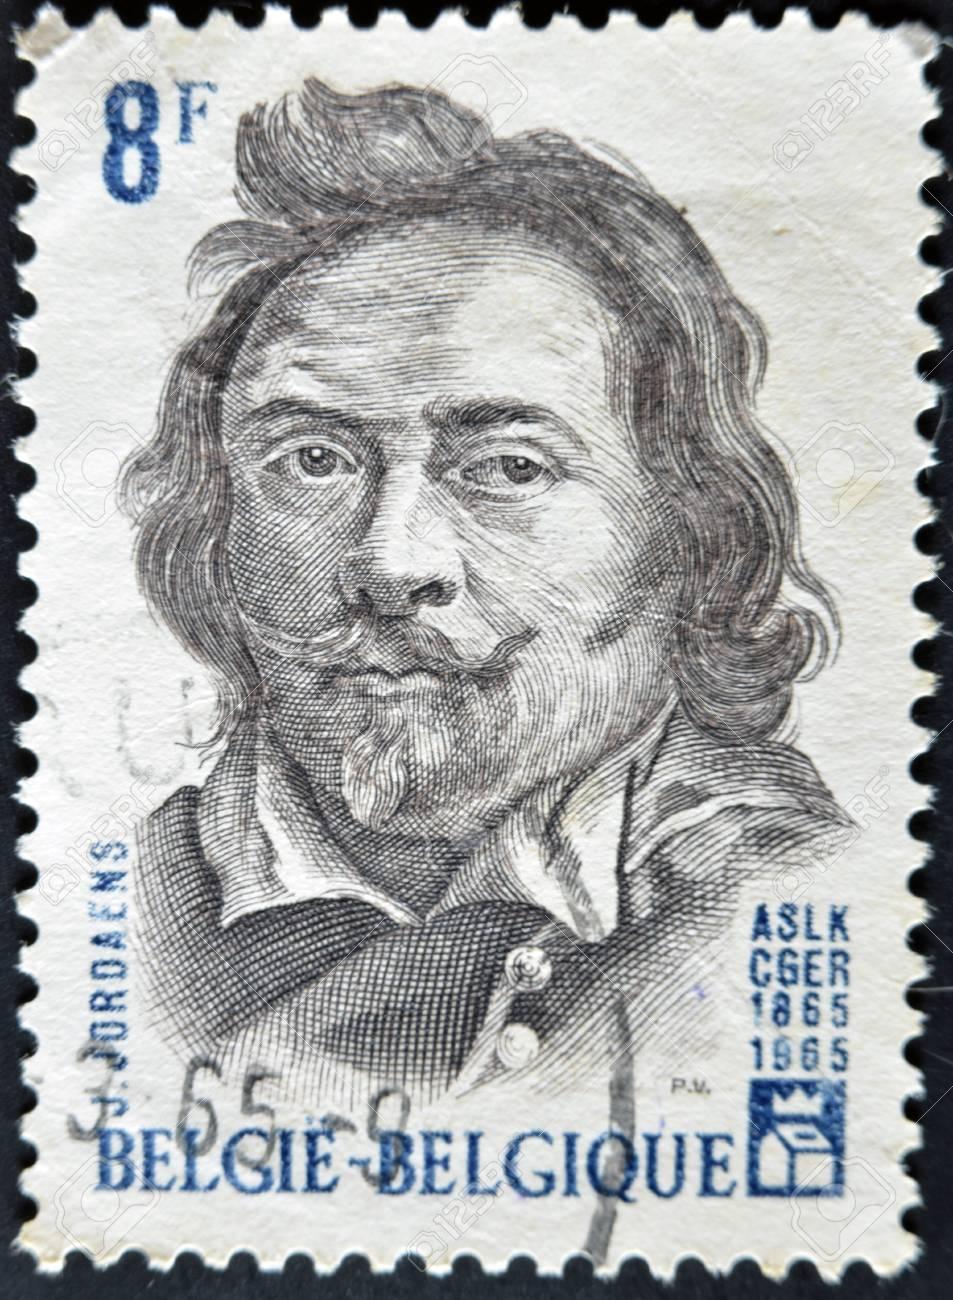 BELGIUM - CIRCA 1965: A stamp printed in Belgium shows Jordaens, circa 1965  Stock Photo - 11805109